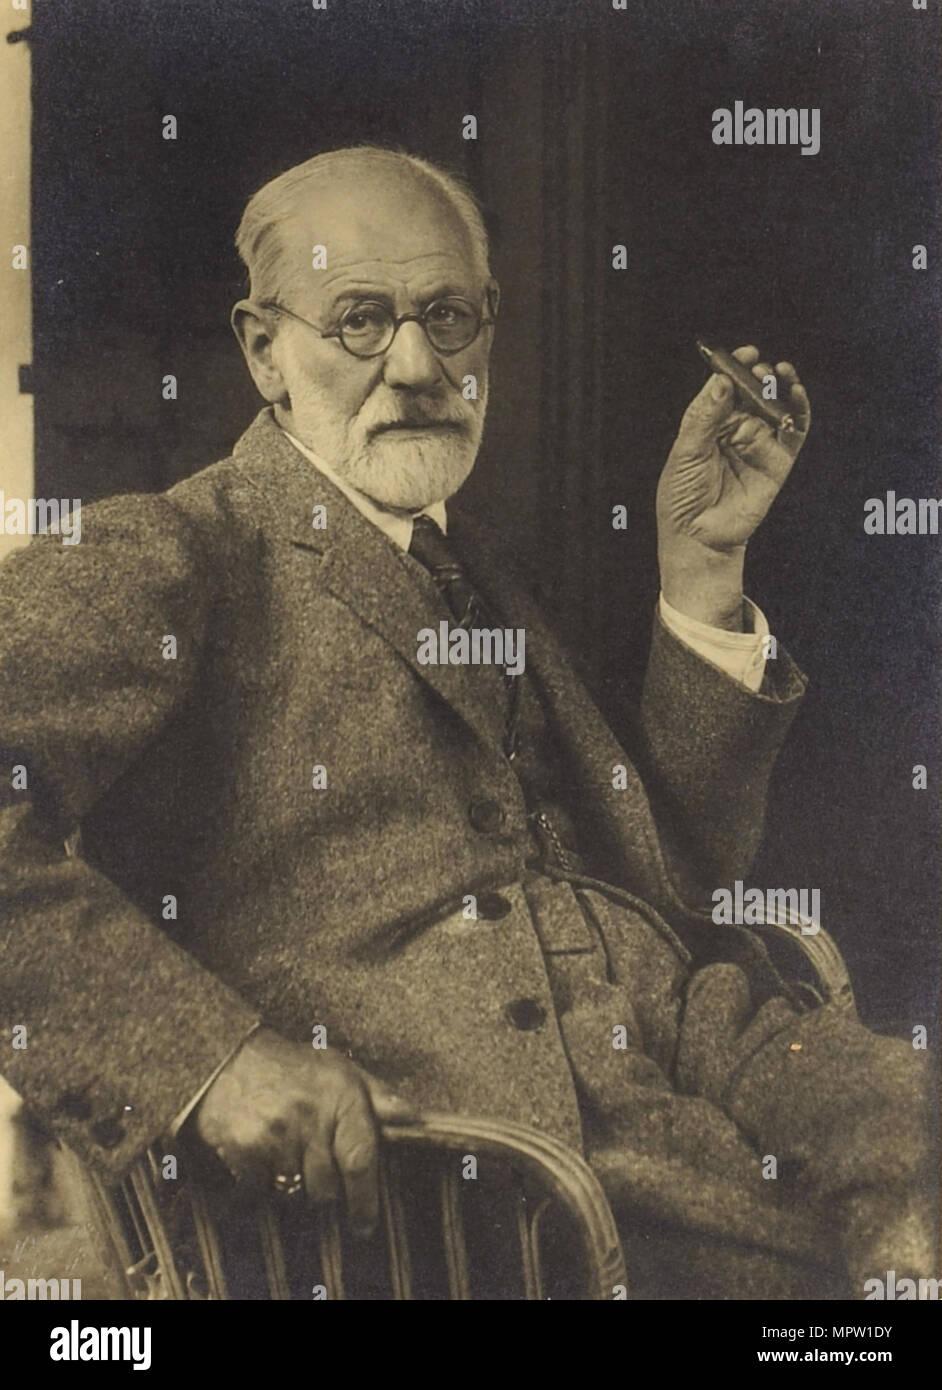 Sigmund Freud, ca 1921. - Stock Image